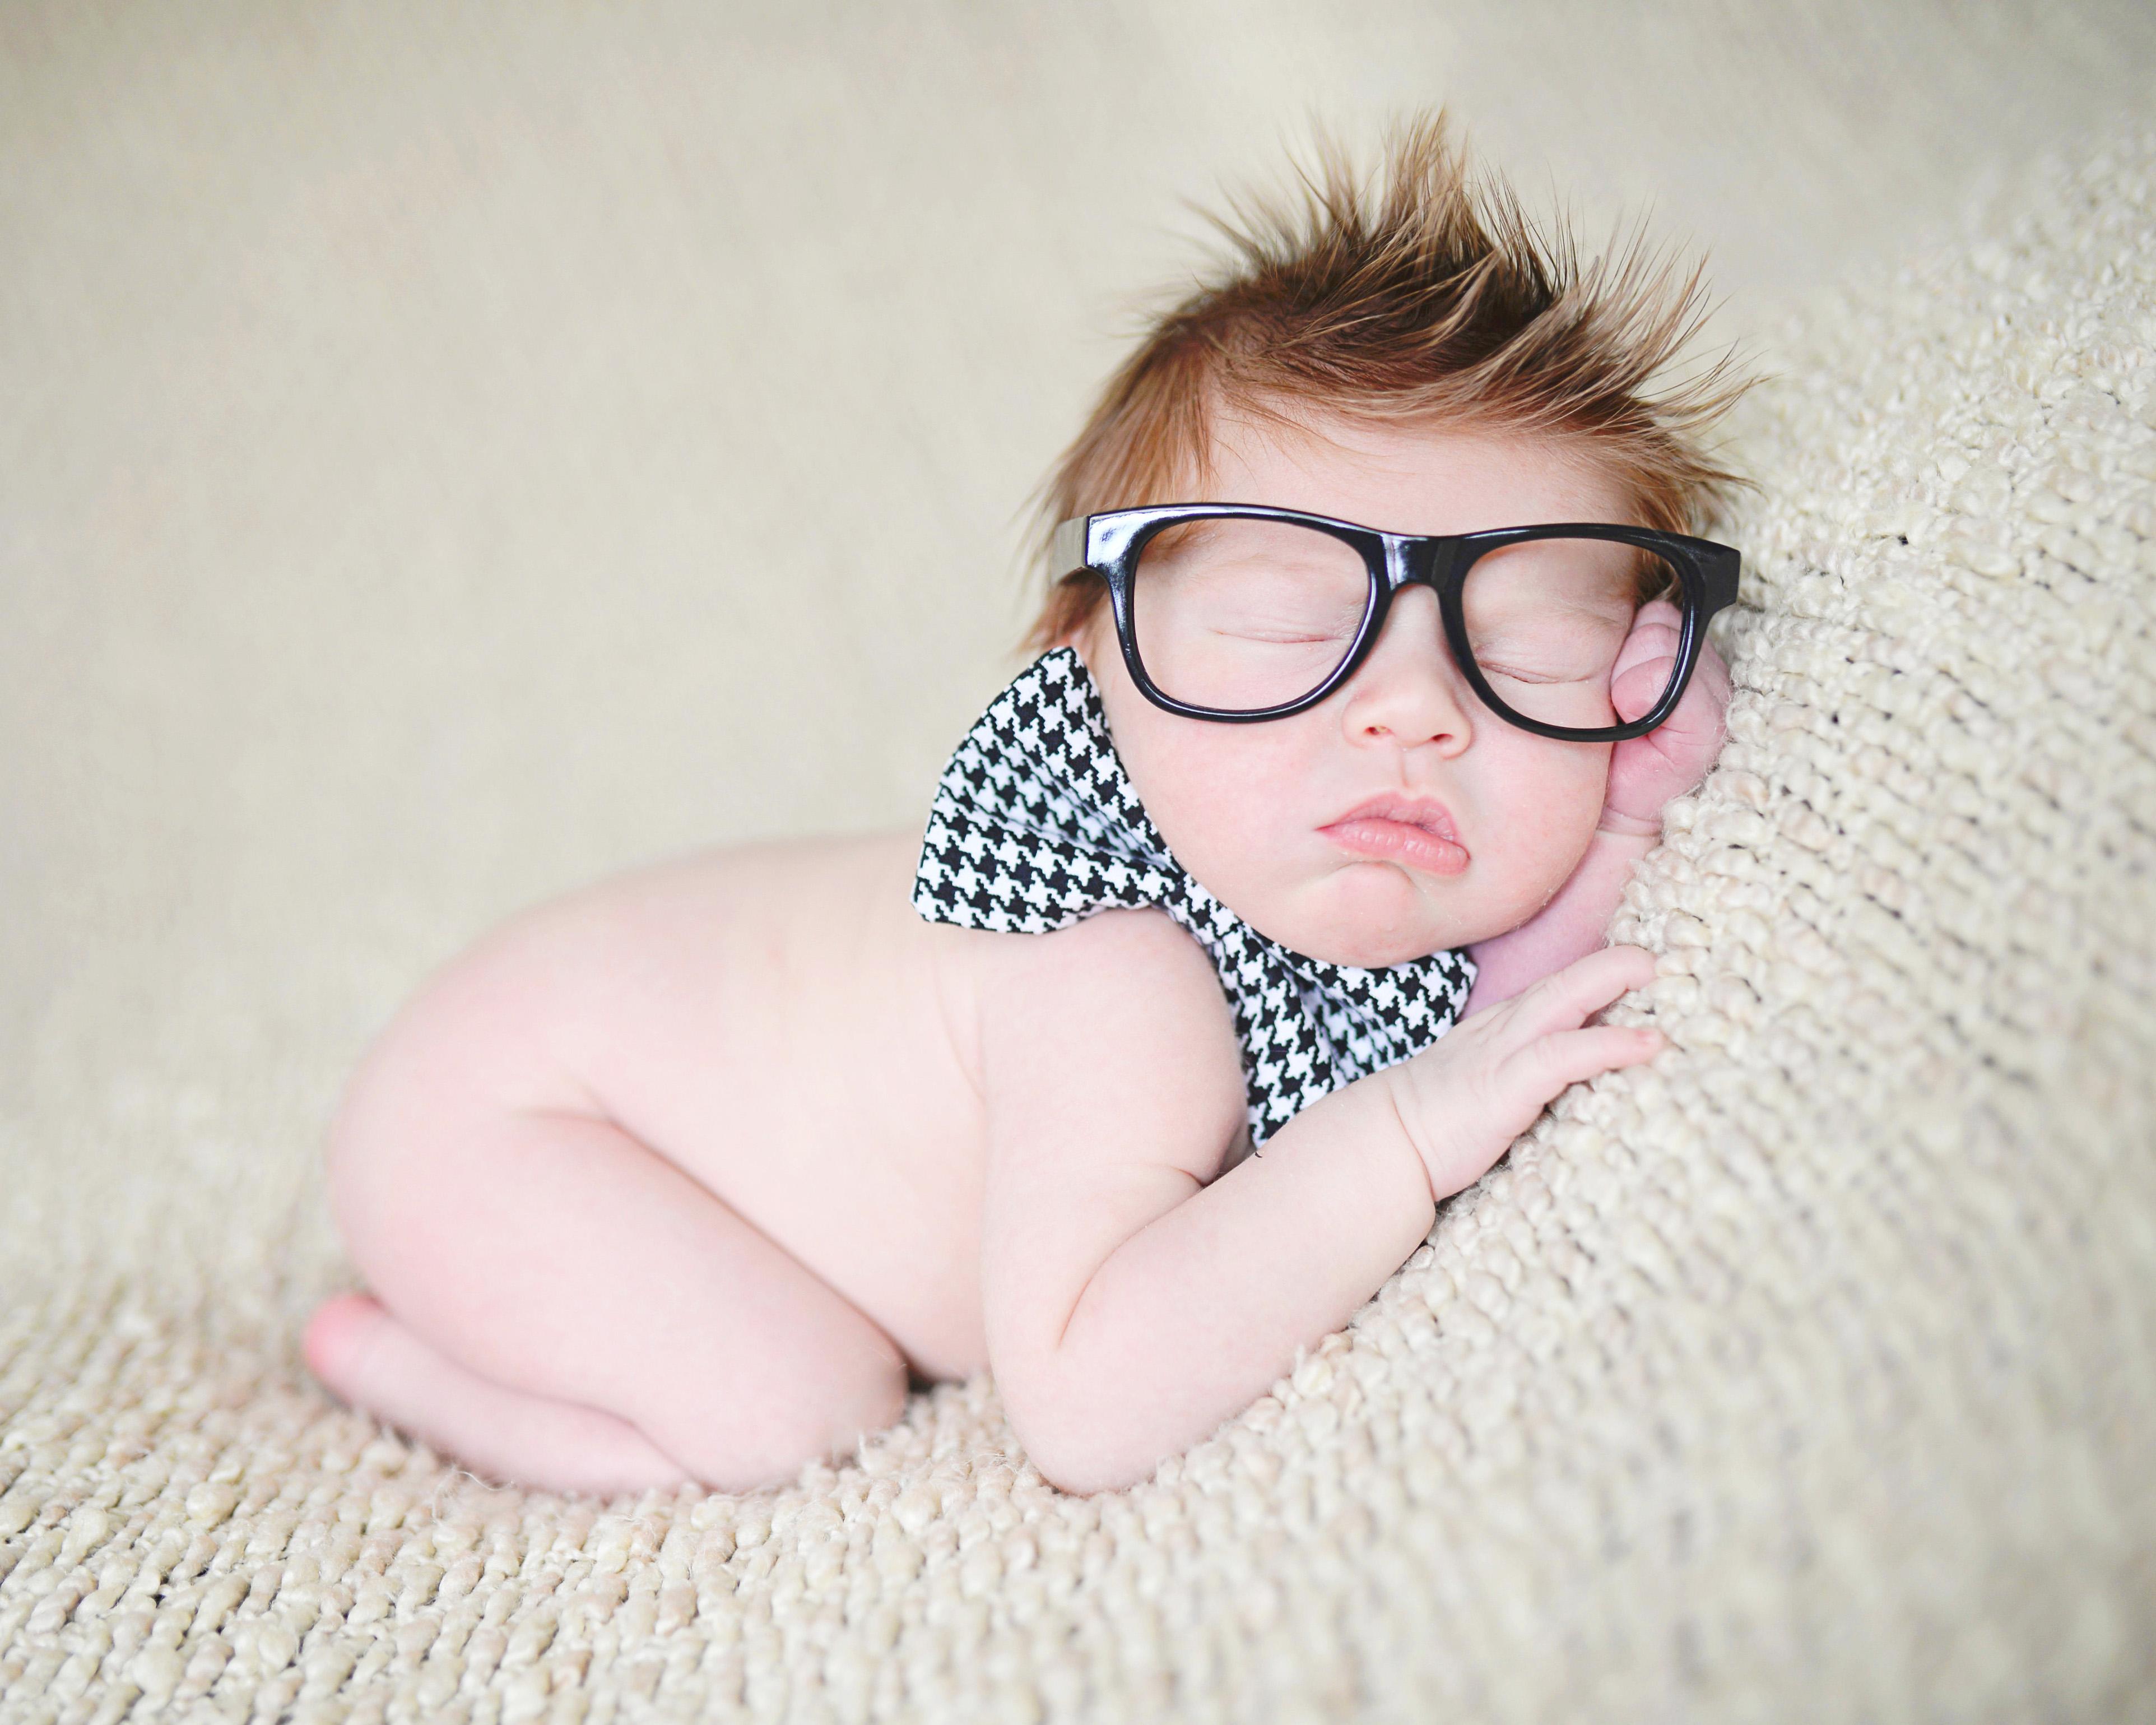 Newborn Baby Boy Portrait Pictures For Wallpaper